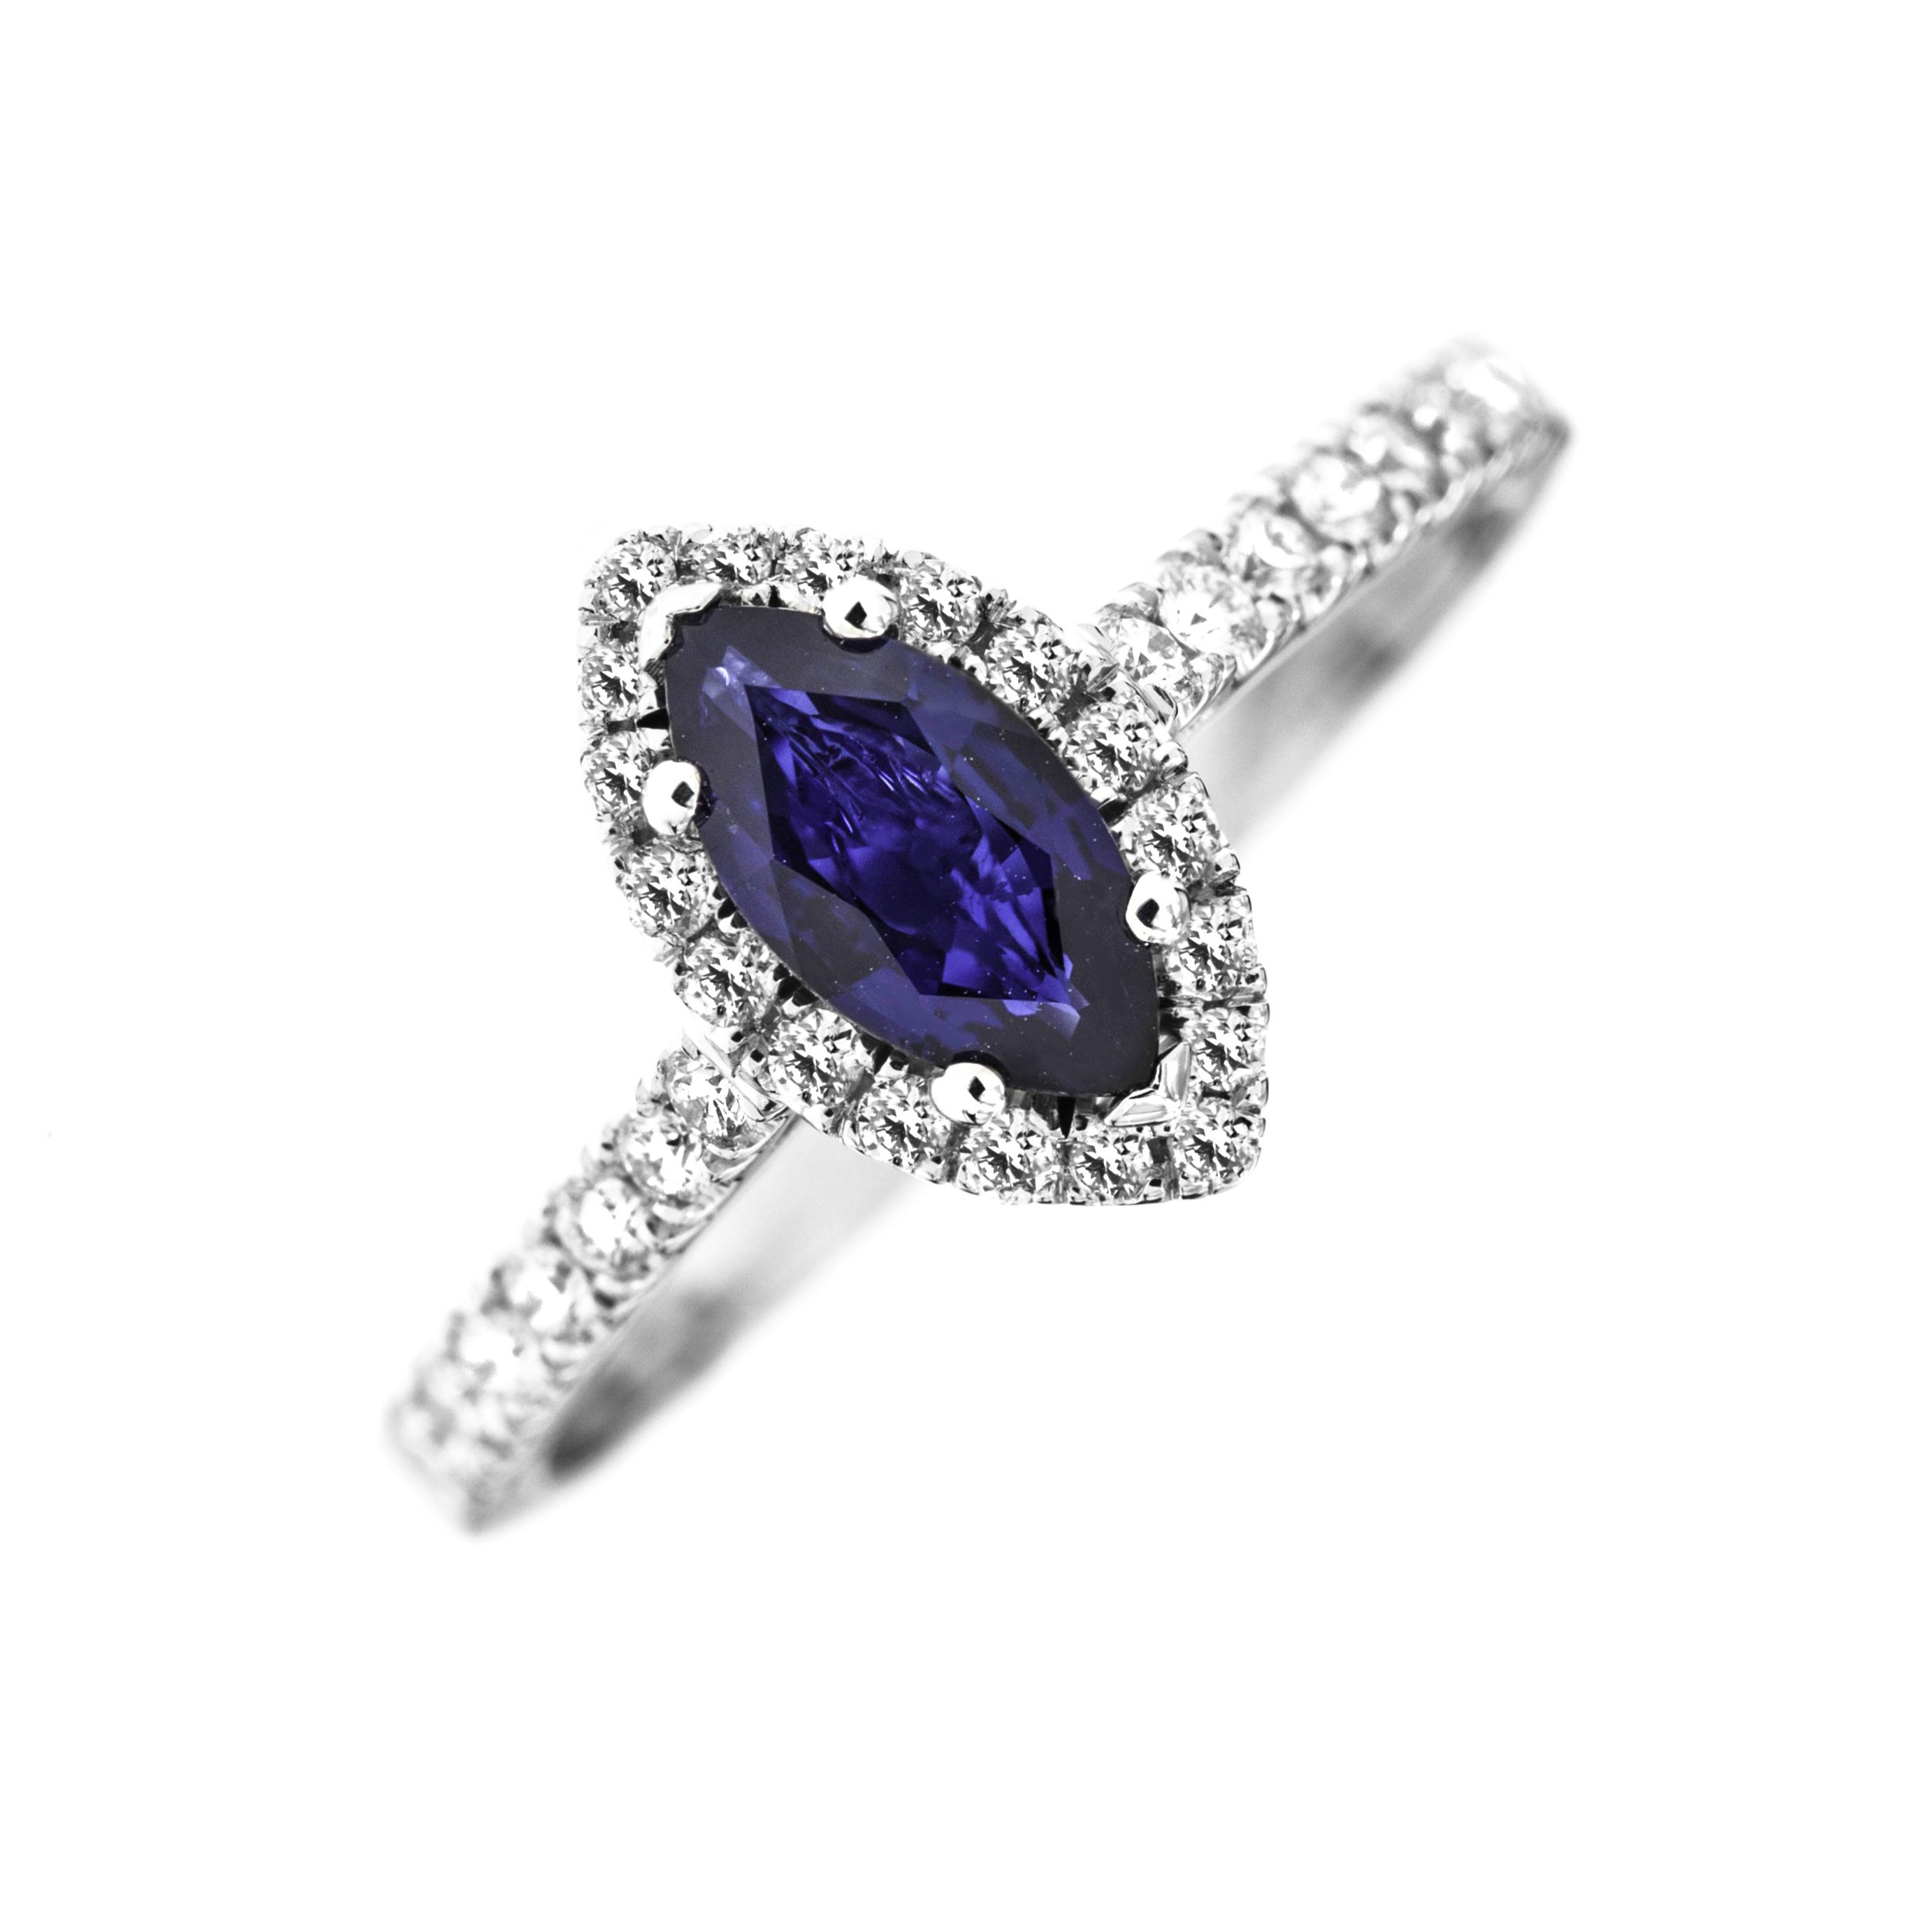 RDS778W-Inel Cocktail/Inel cu Safir si Diamante Dama Aur Alb 18kt cu Safir Forma Marchiza si Diamante Rotunde Mici-img1